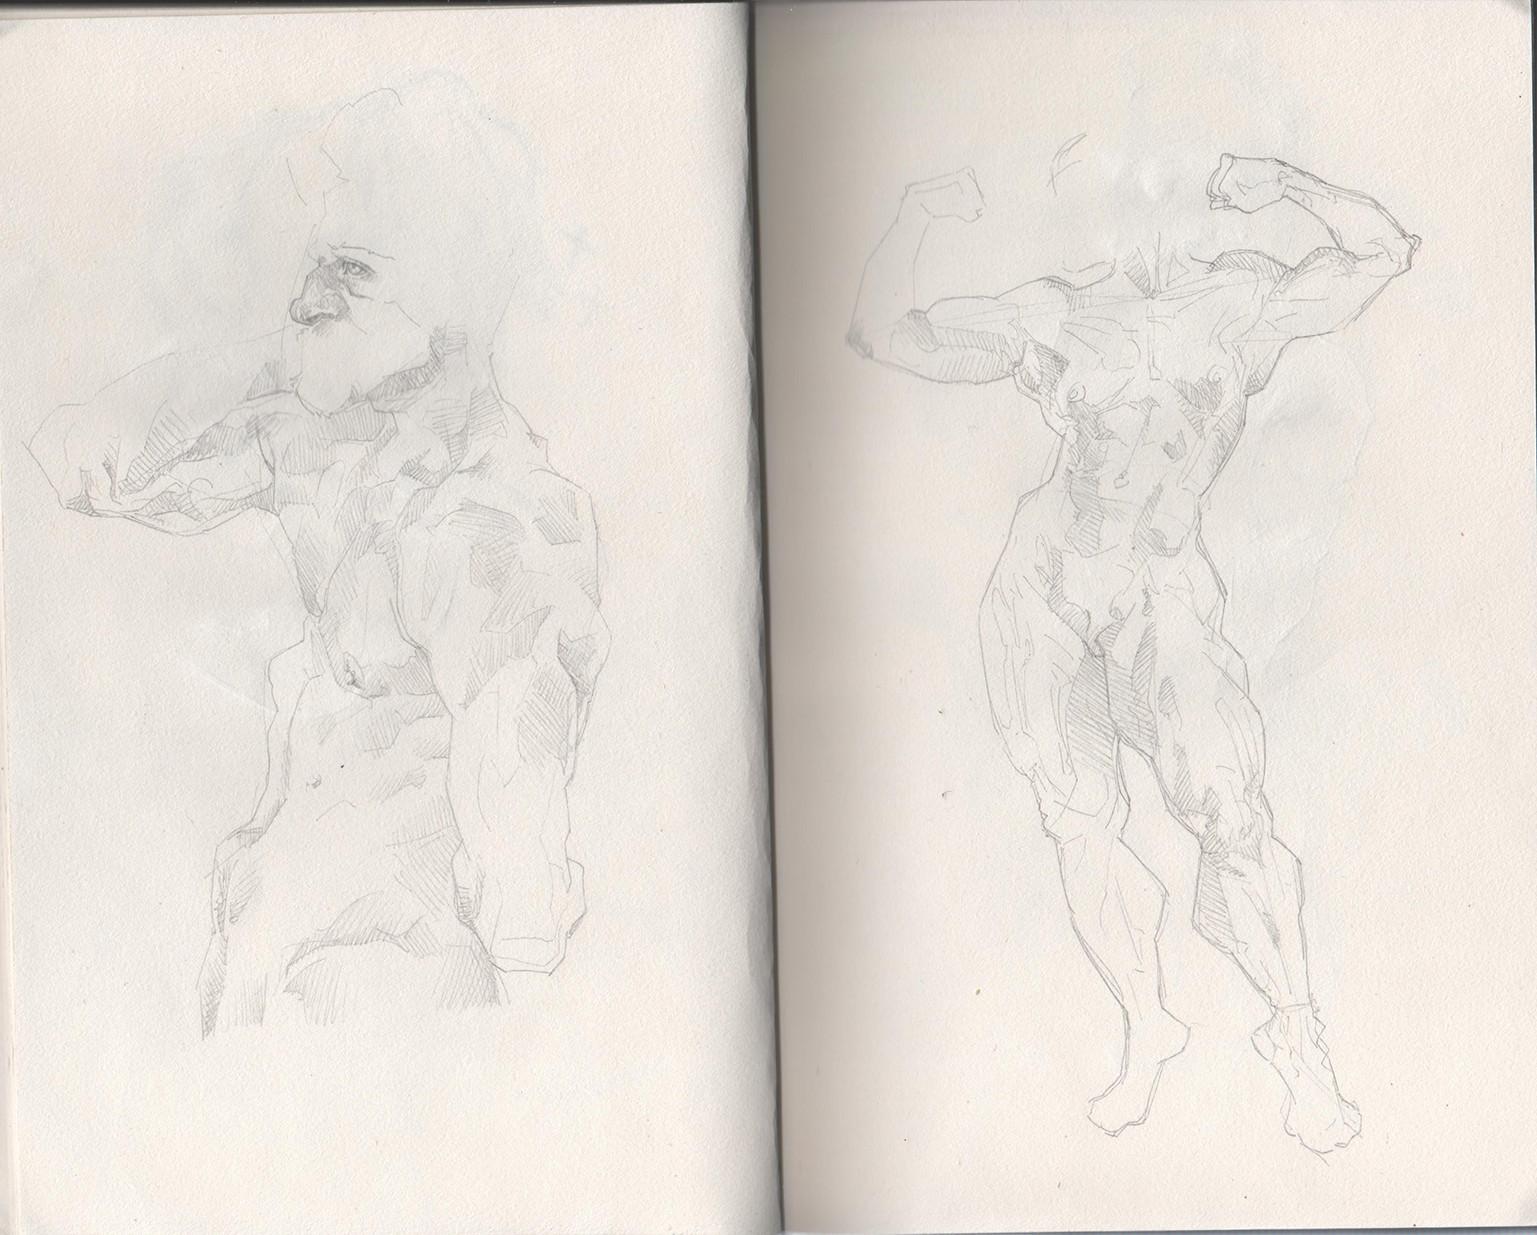 Tony gbeulie post sketch6